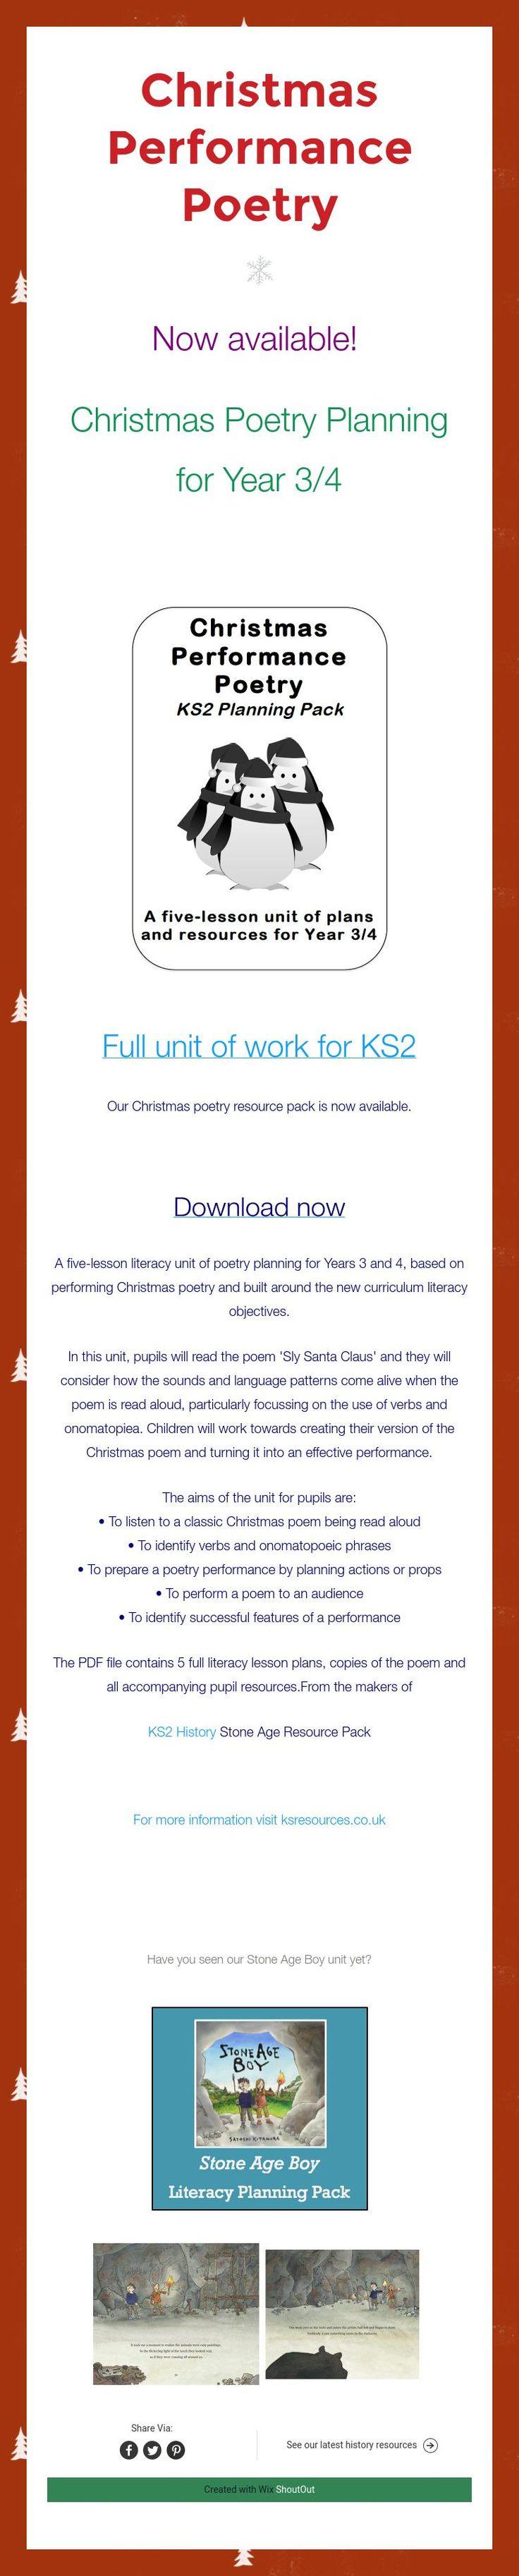 Worksheet. 196 best Primary School Poetry images on Pinterest  Primary